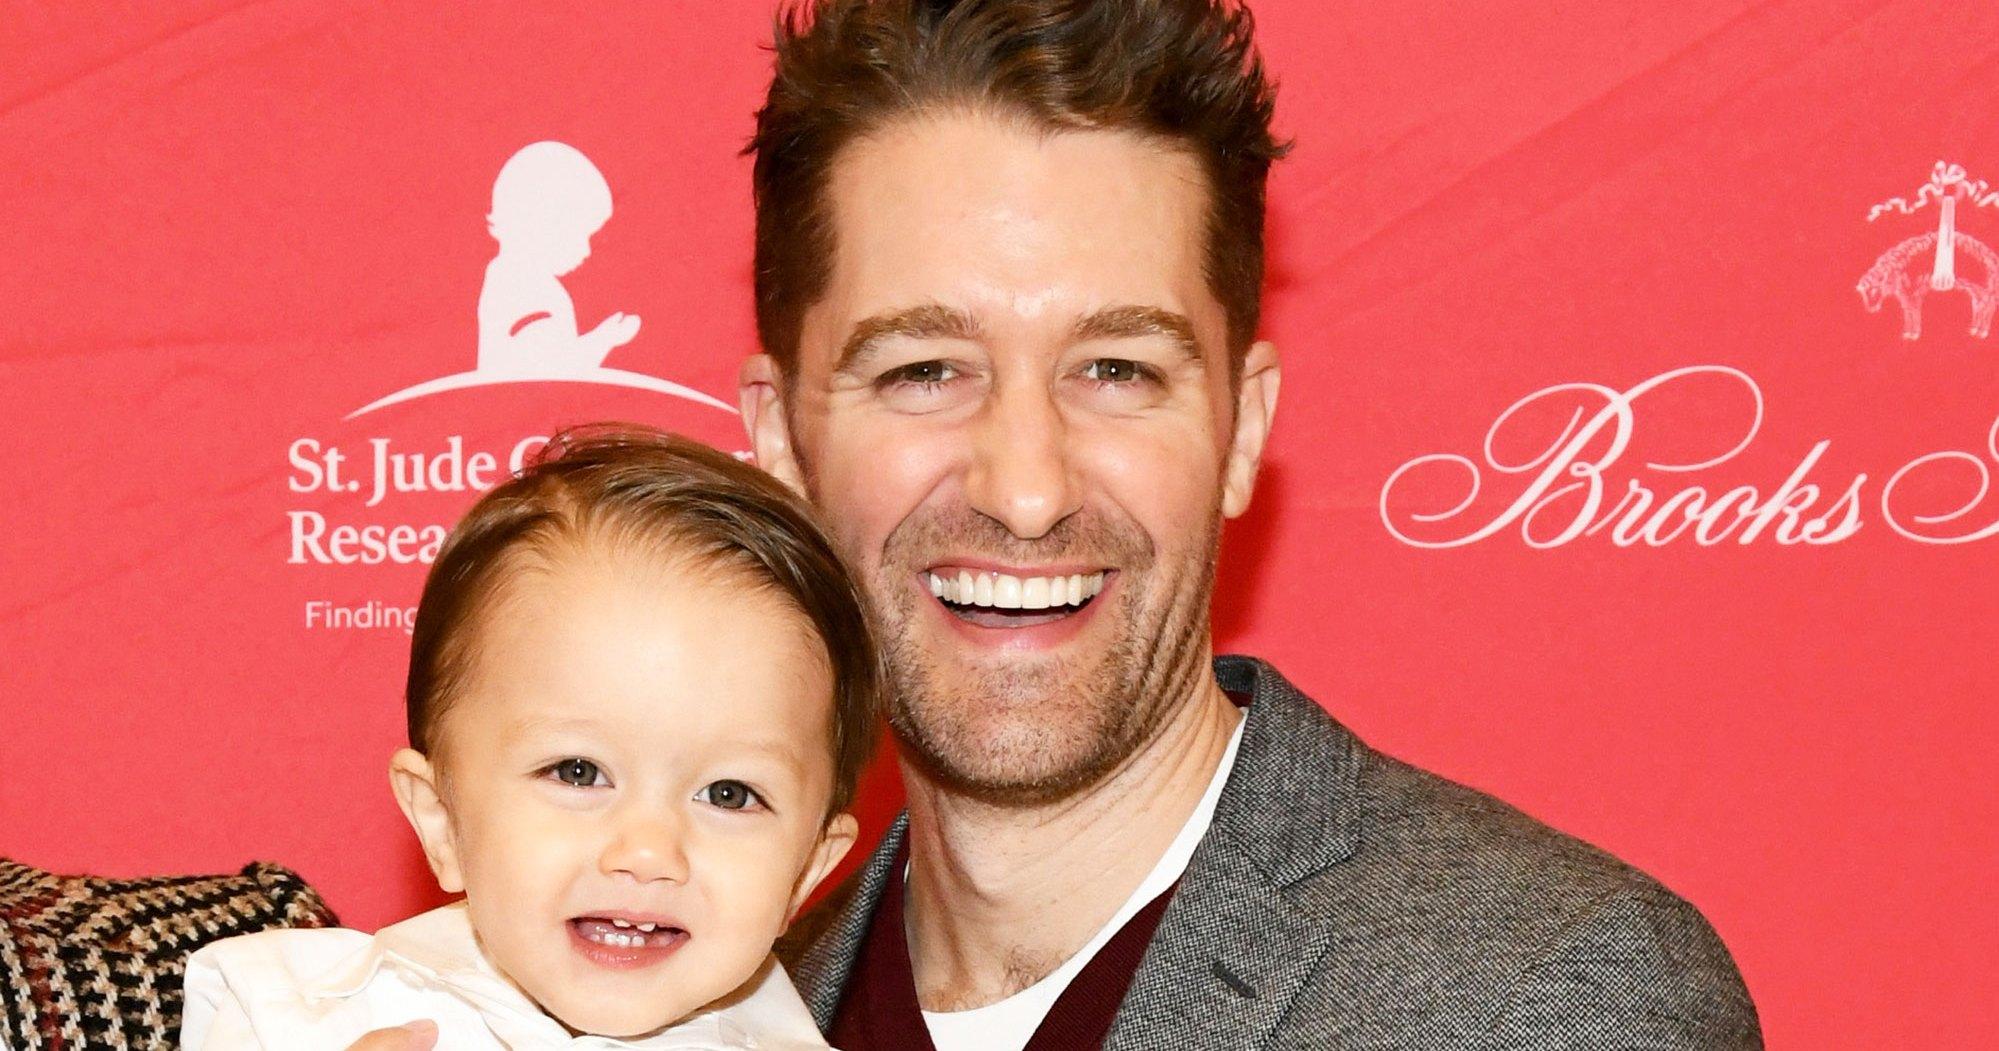 Matthew Morrison's Son Hasn't Seen Him in His 'Prime' on 'Glee'